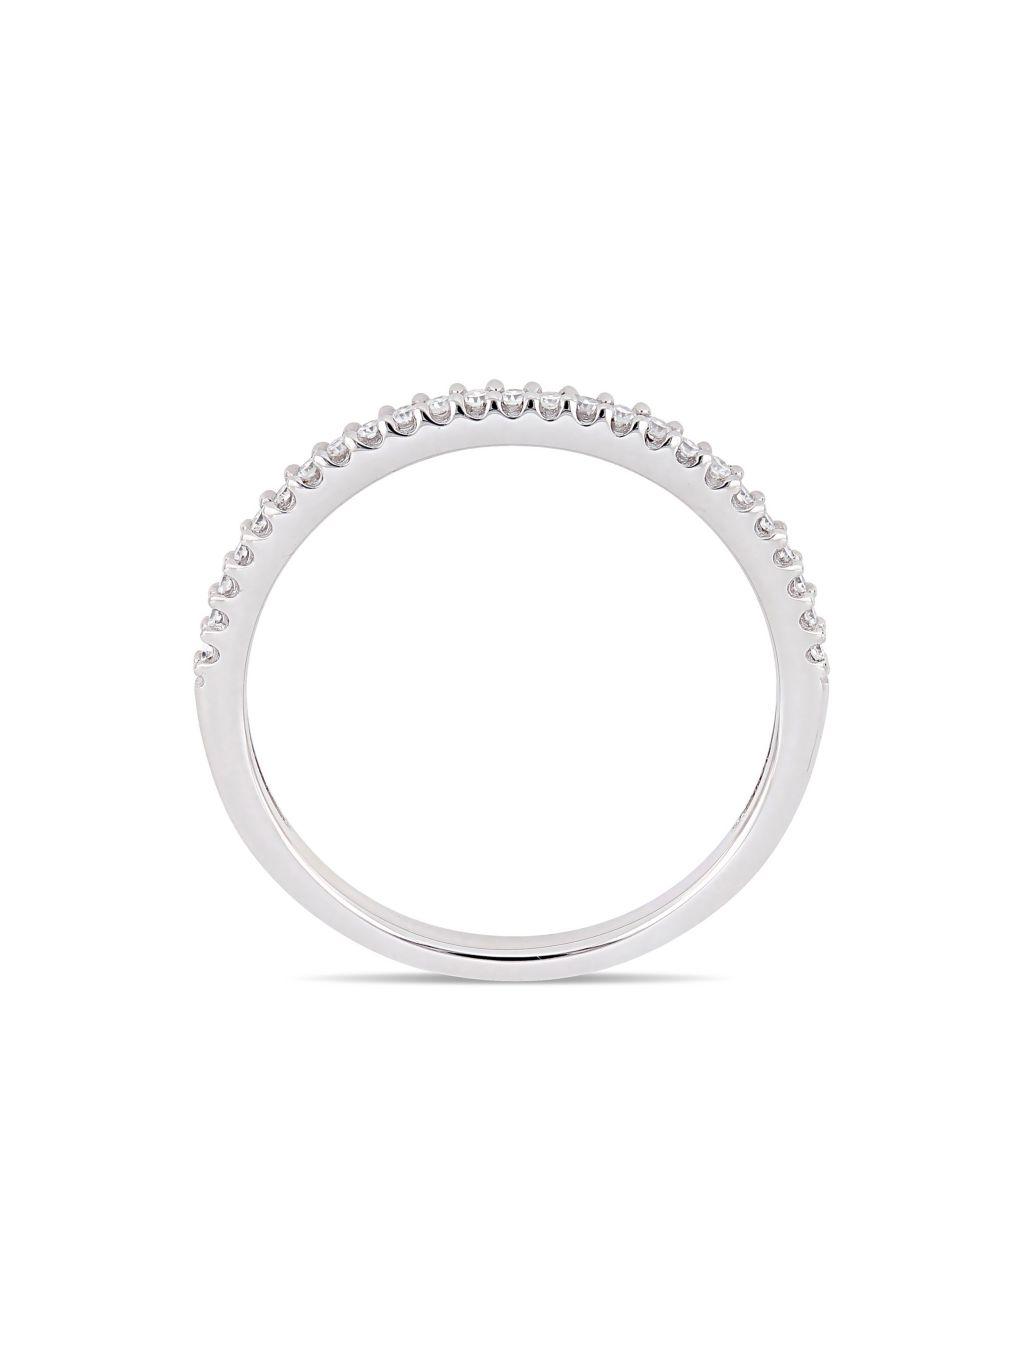 Sonatina 14K White Gold & Diamond Band Ring